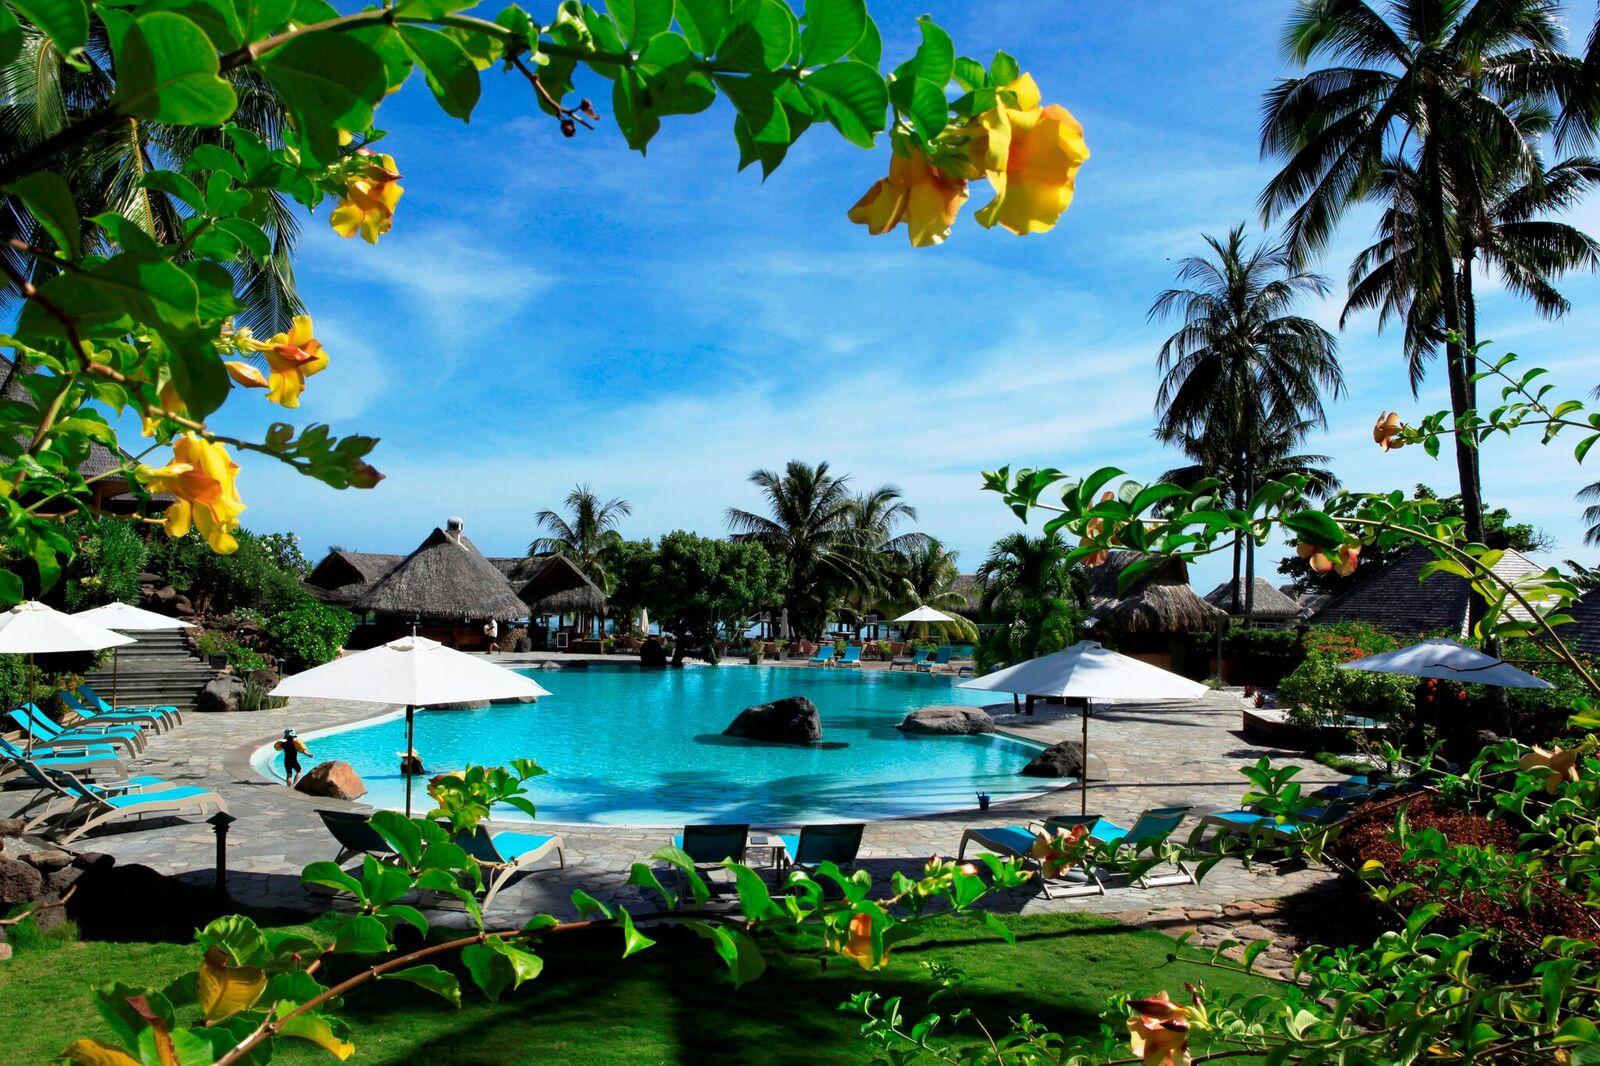 Tahiti ultimate vacation 7 nights moorea and bora bora for Garden pool bungalow moorea pearl resort